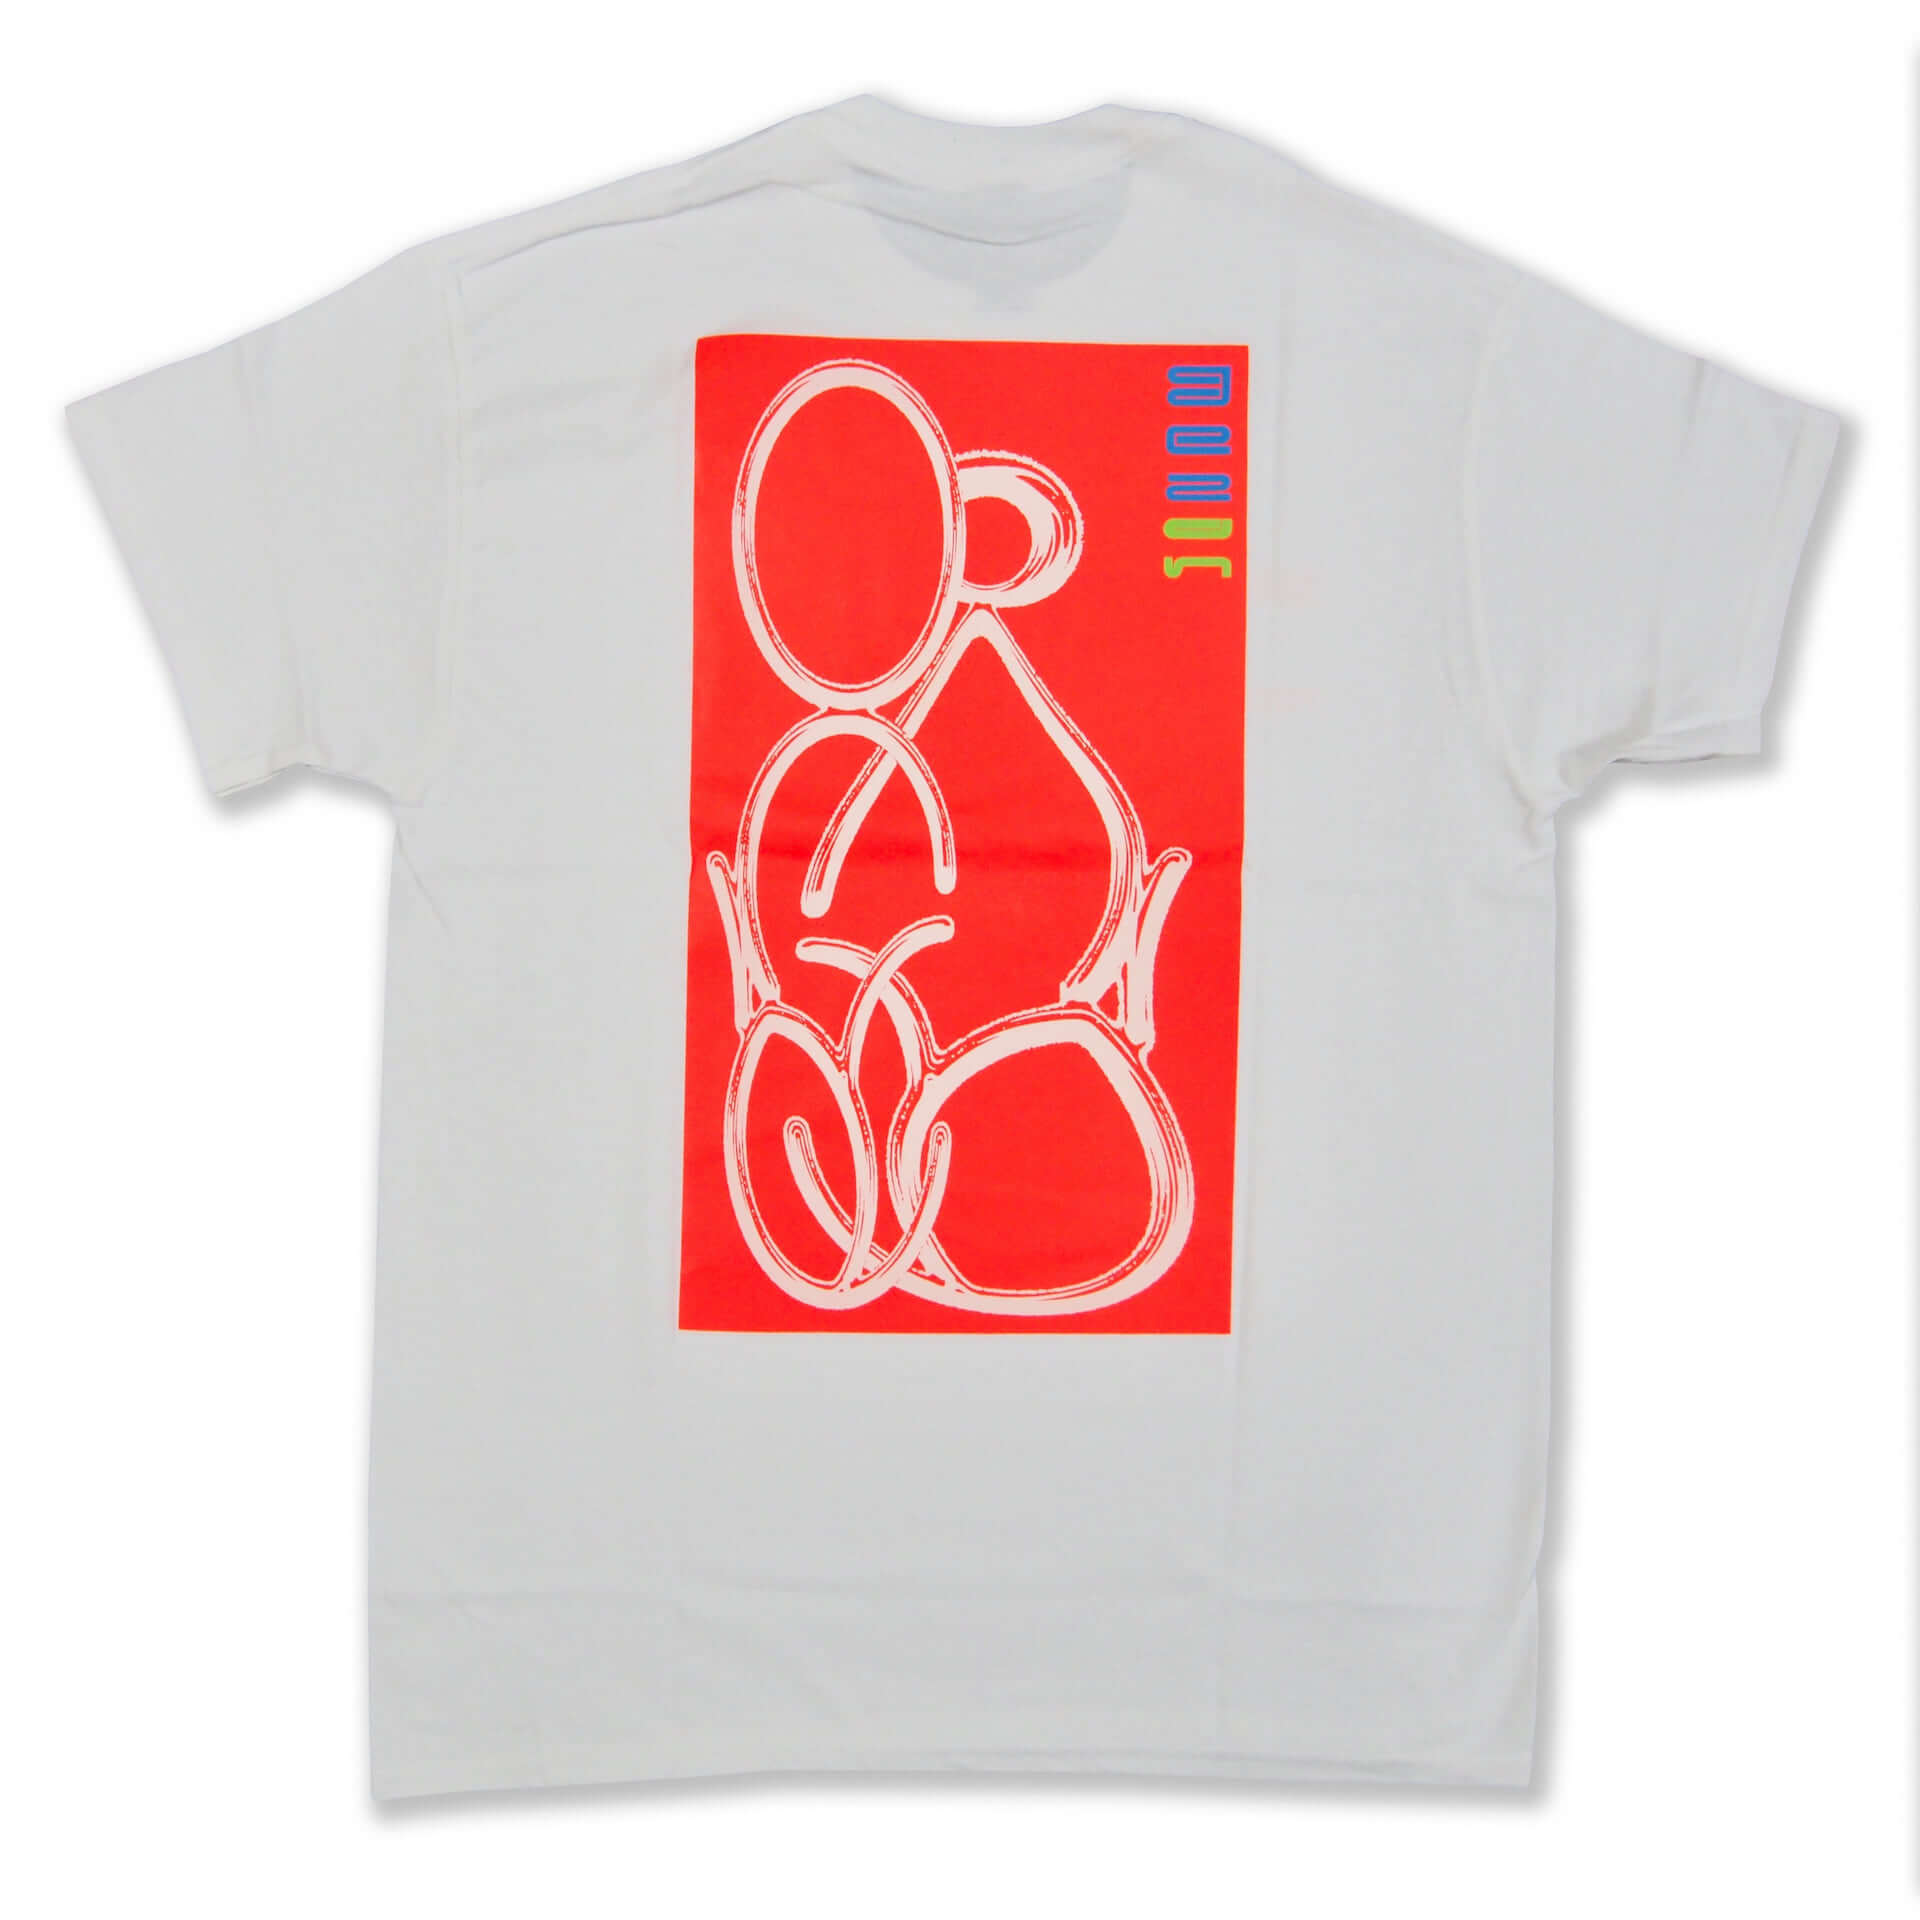 GEZAN主宰〈十三月〉の公式グッズや限定LPがGAN-BAN店頭で販売開始!マヒトゥ・ザ・ピーポー、NUUAMMのCDも展開 music210316_gezan_5-1920x1920